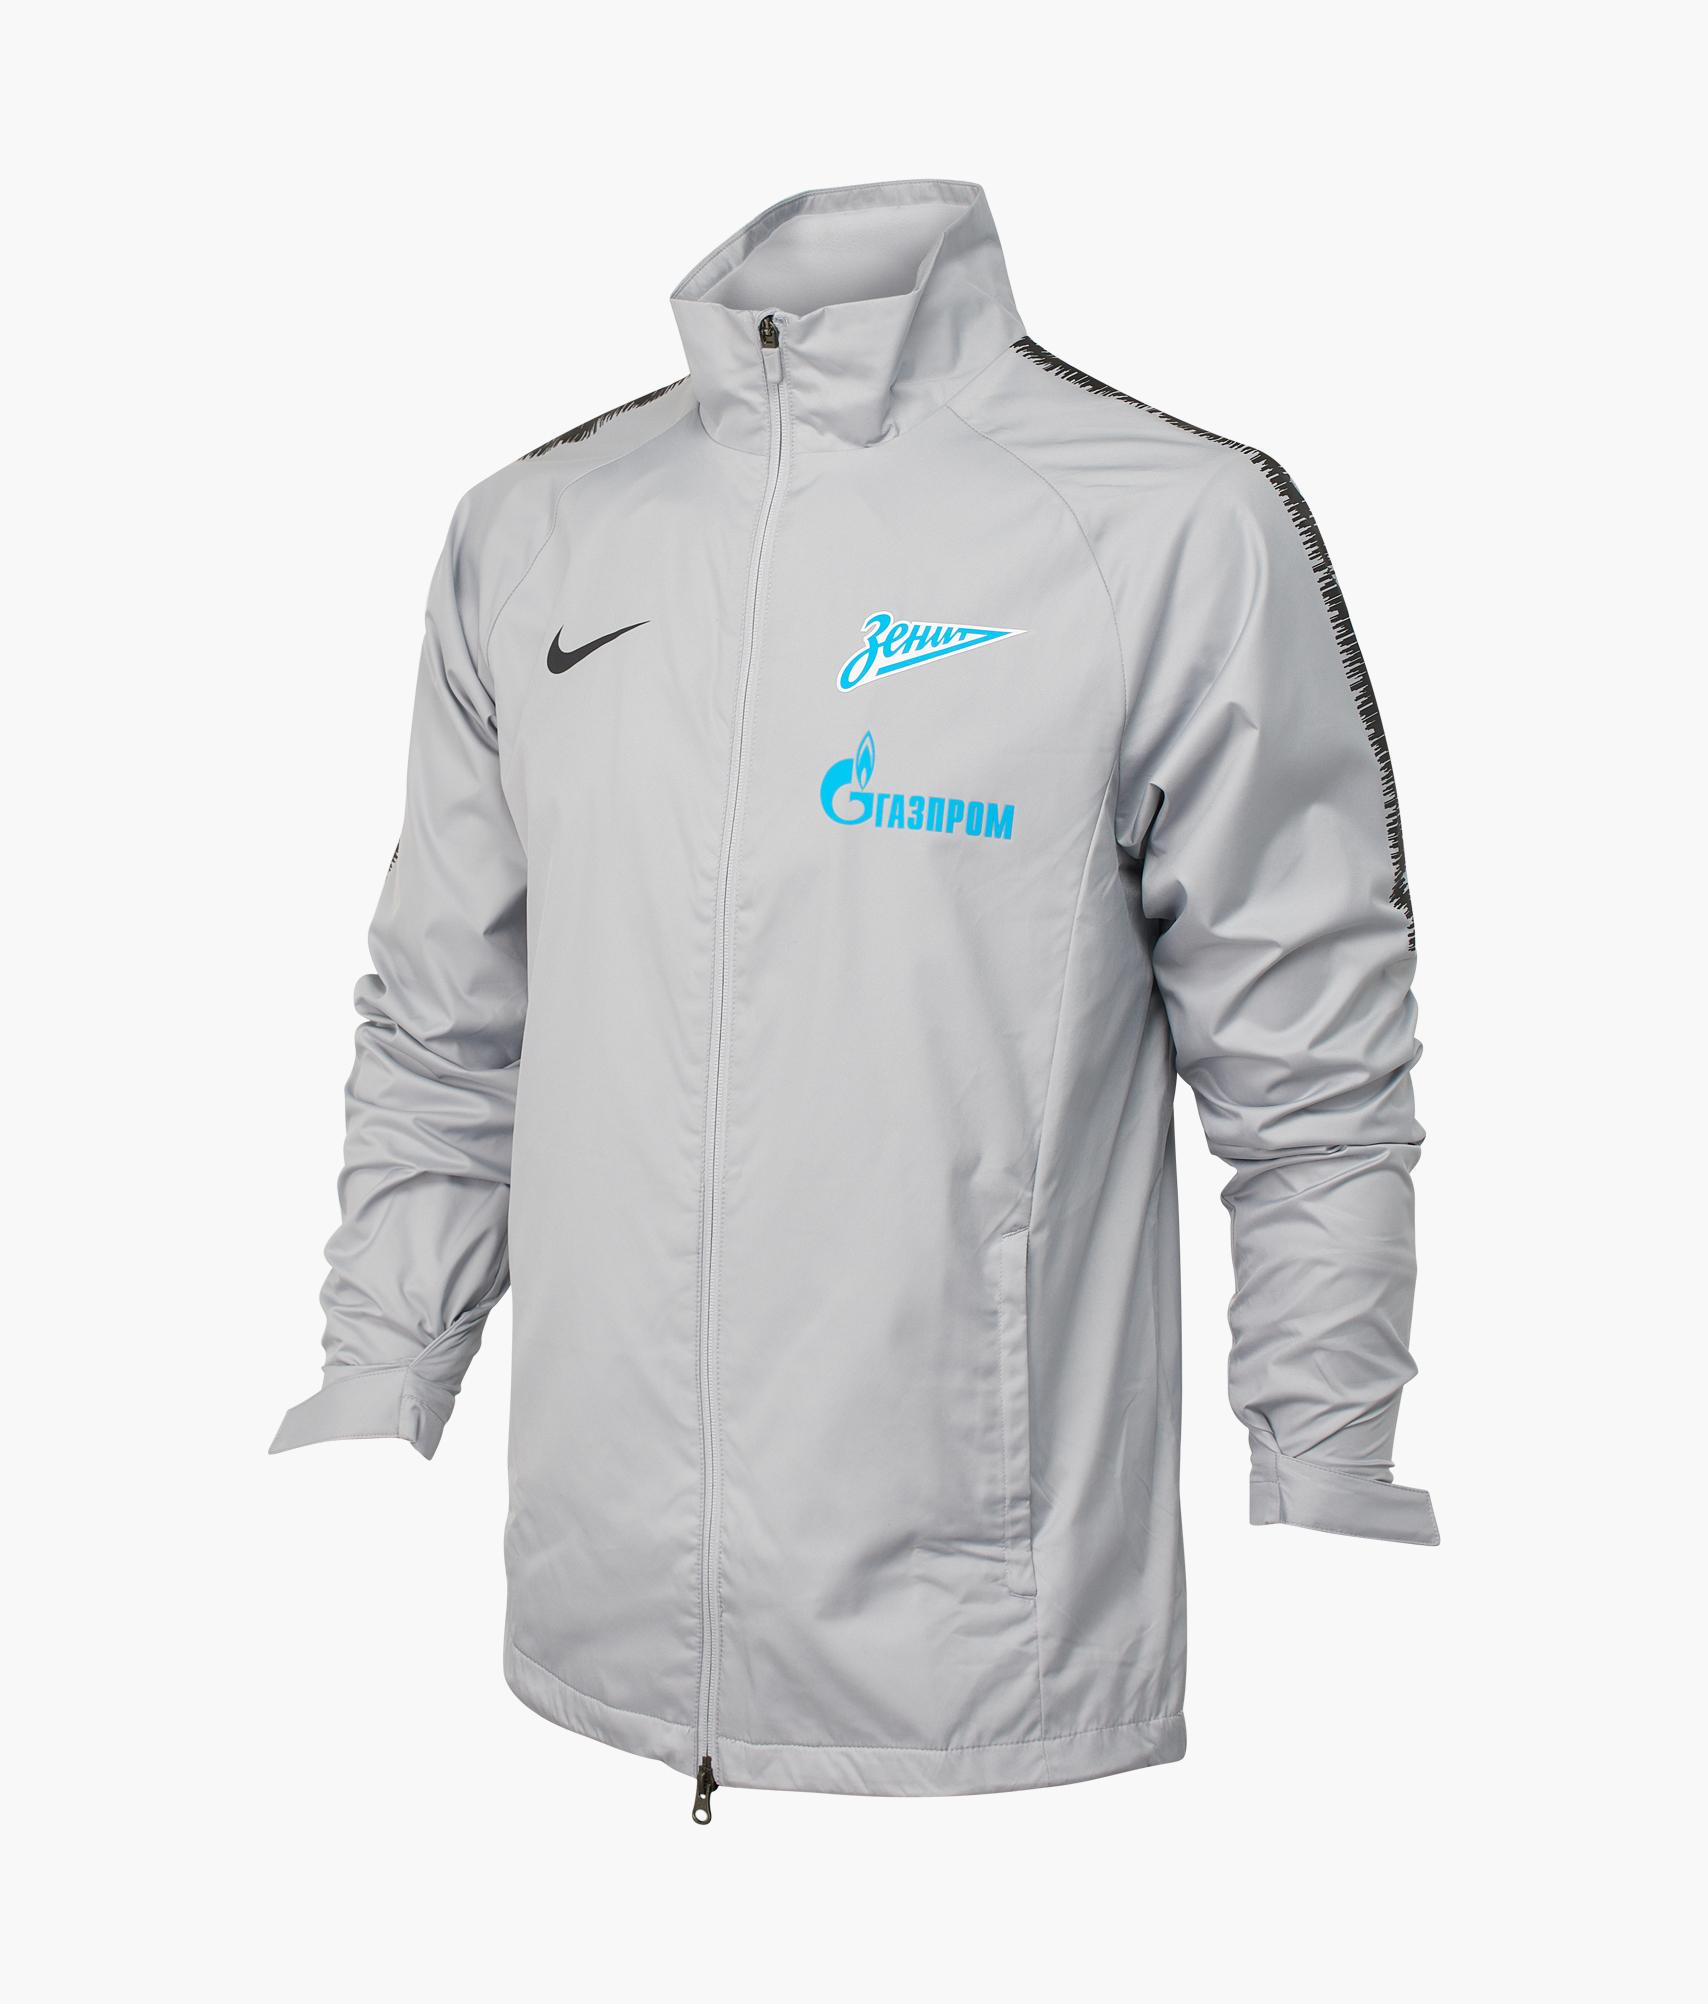 Ветрозащитная куртка Nike Zenit 2018/19 Nike Цвет-Серый